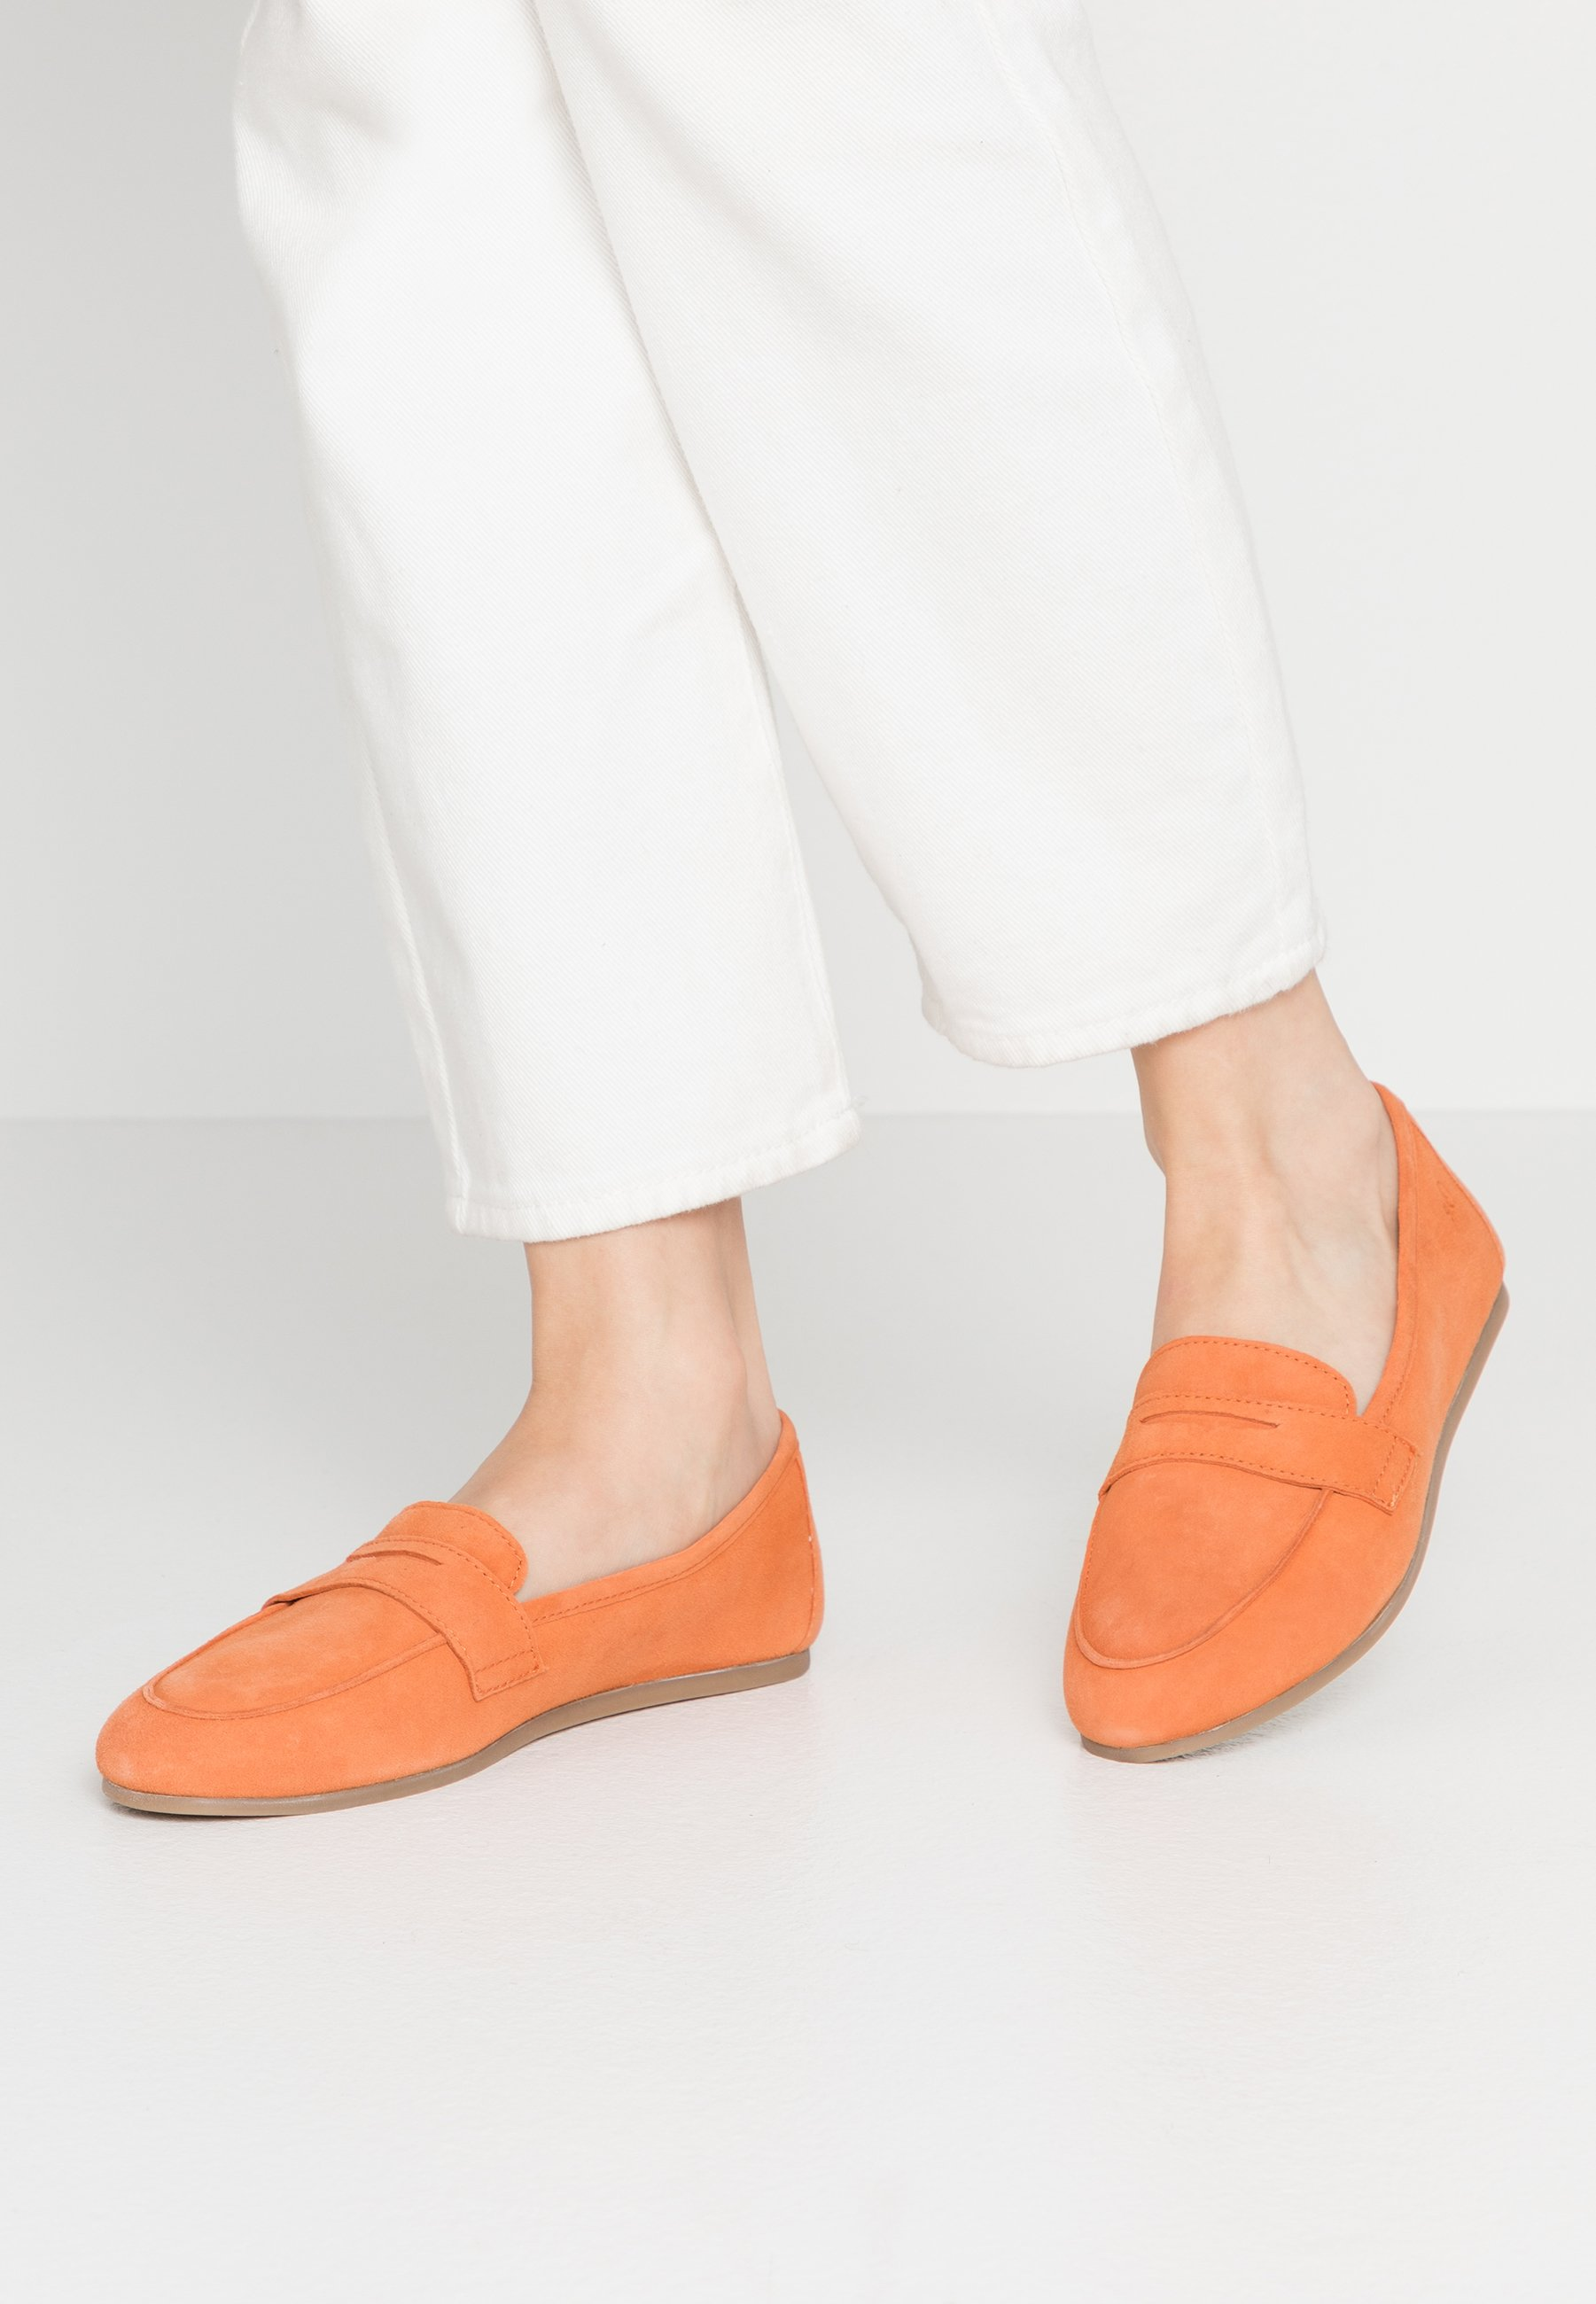 5 5 24203 24 Slipper orange